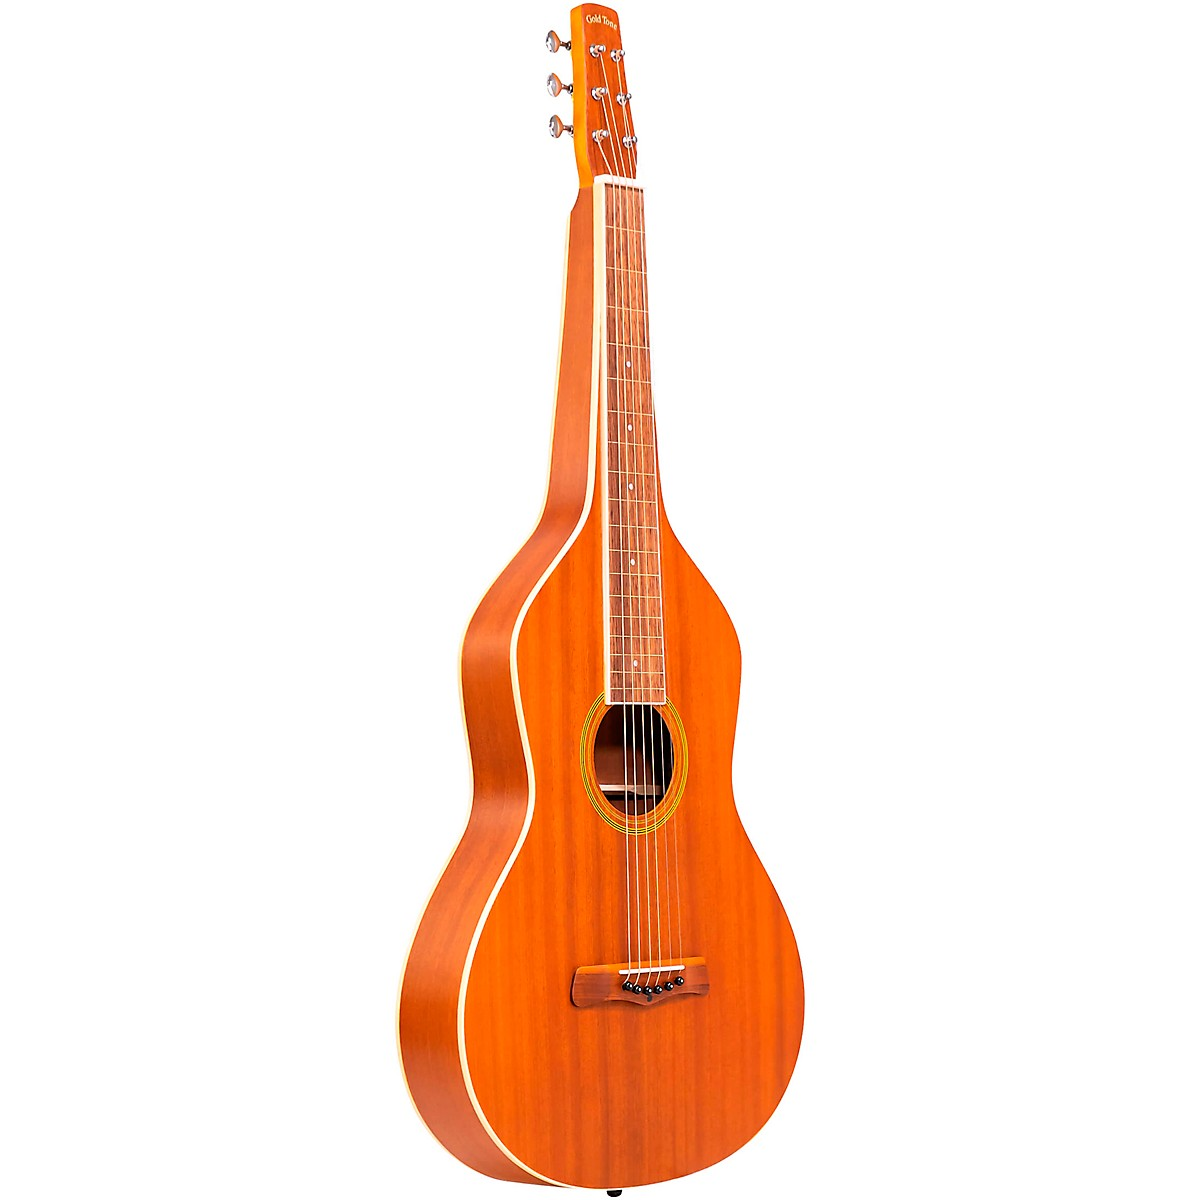 Gold Tone GT-Weissenborn Hawaiian-Style LapSteel Guitar with Gig Bag